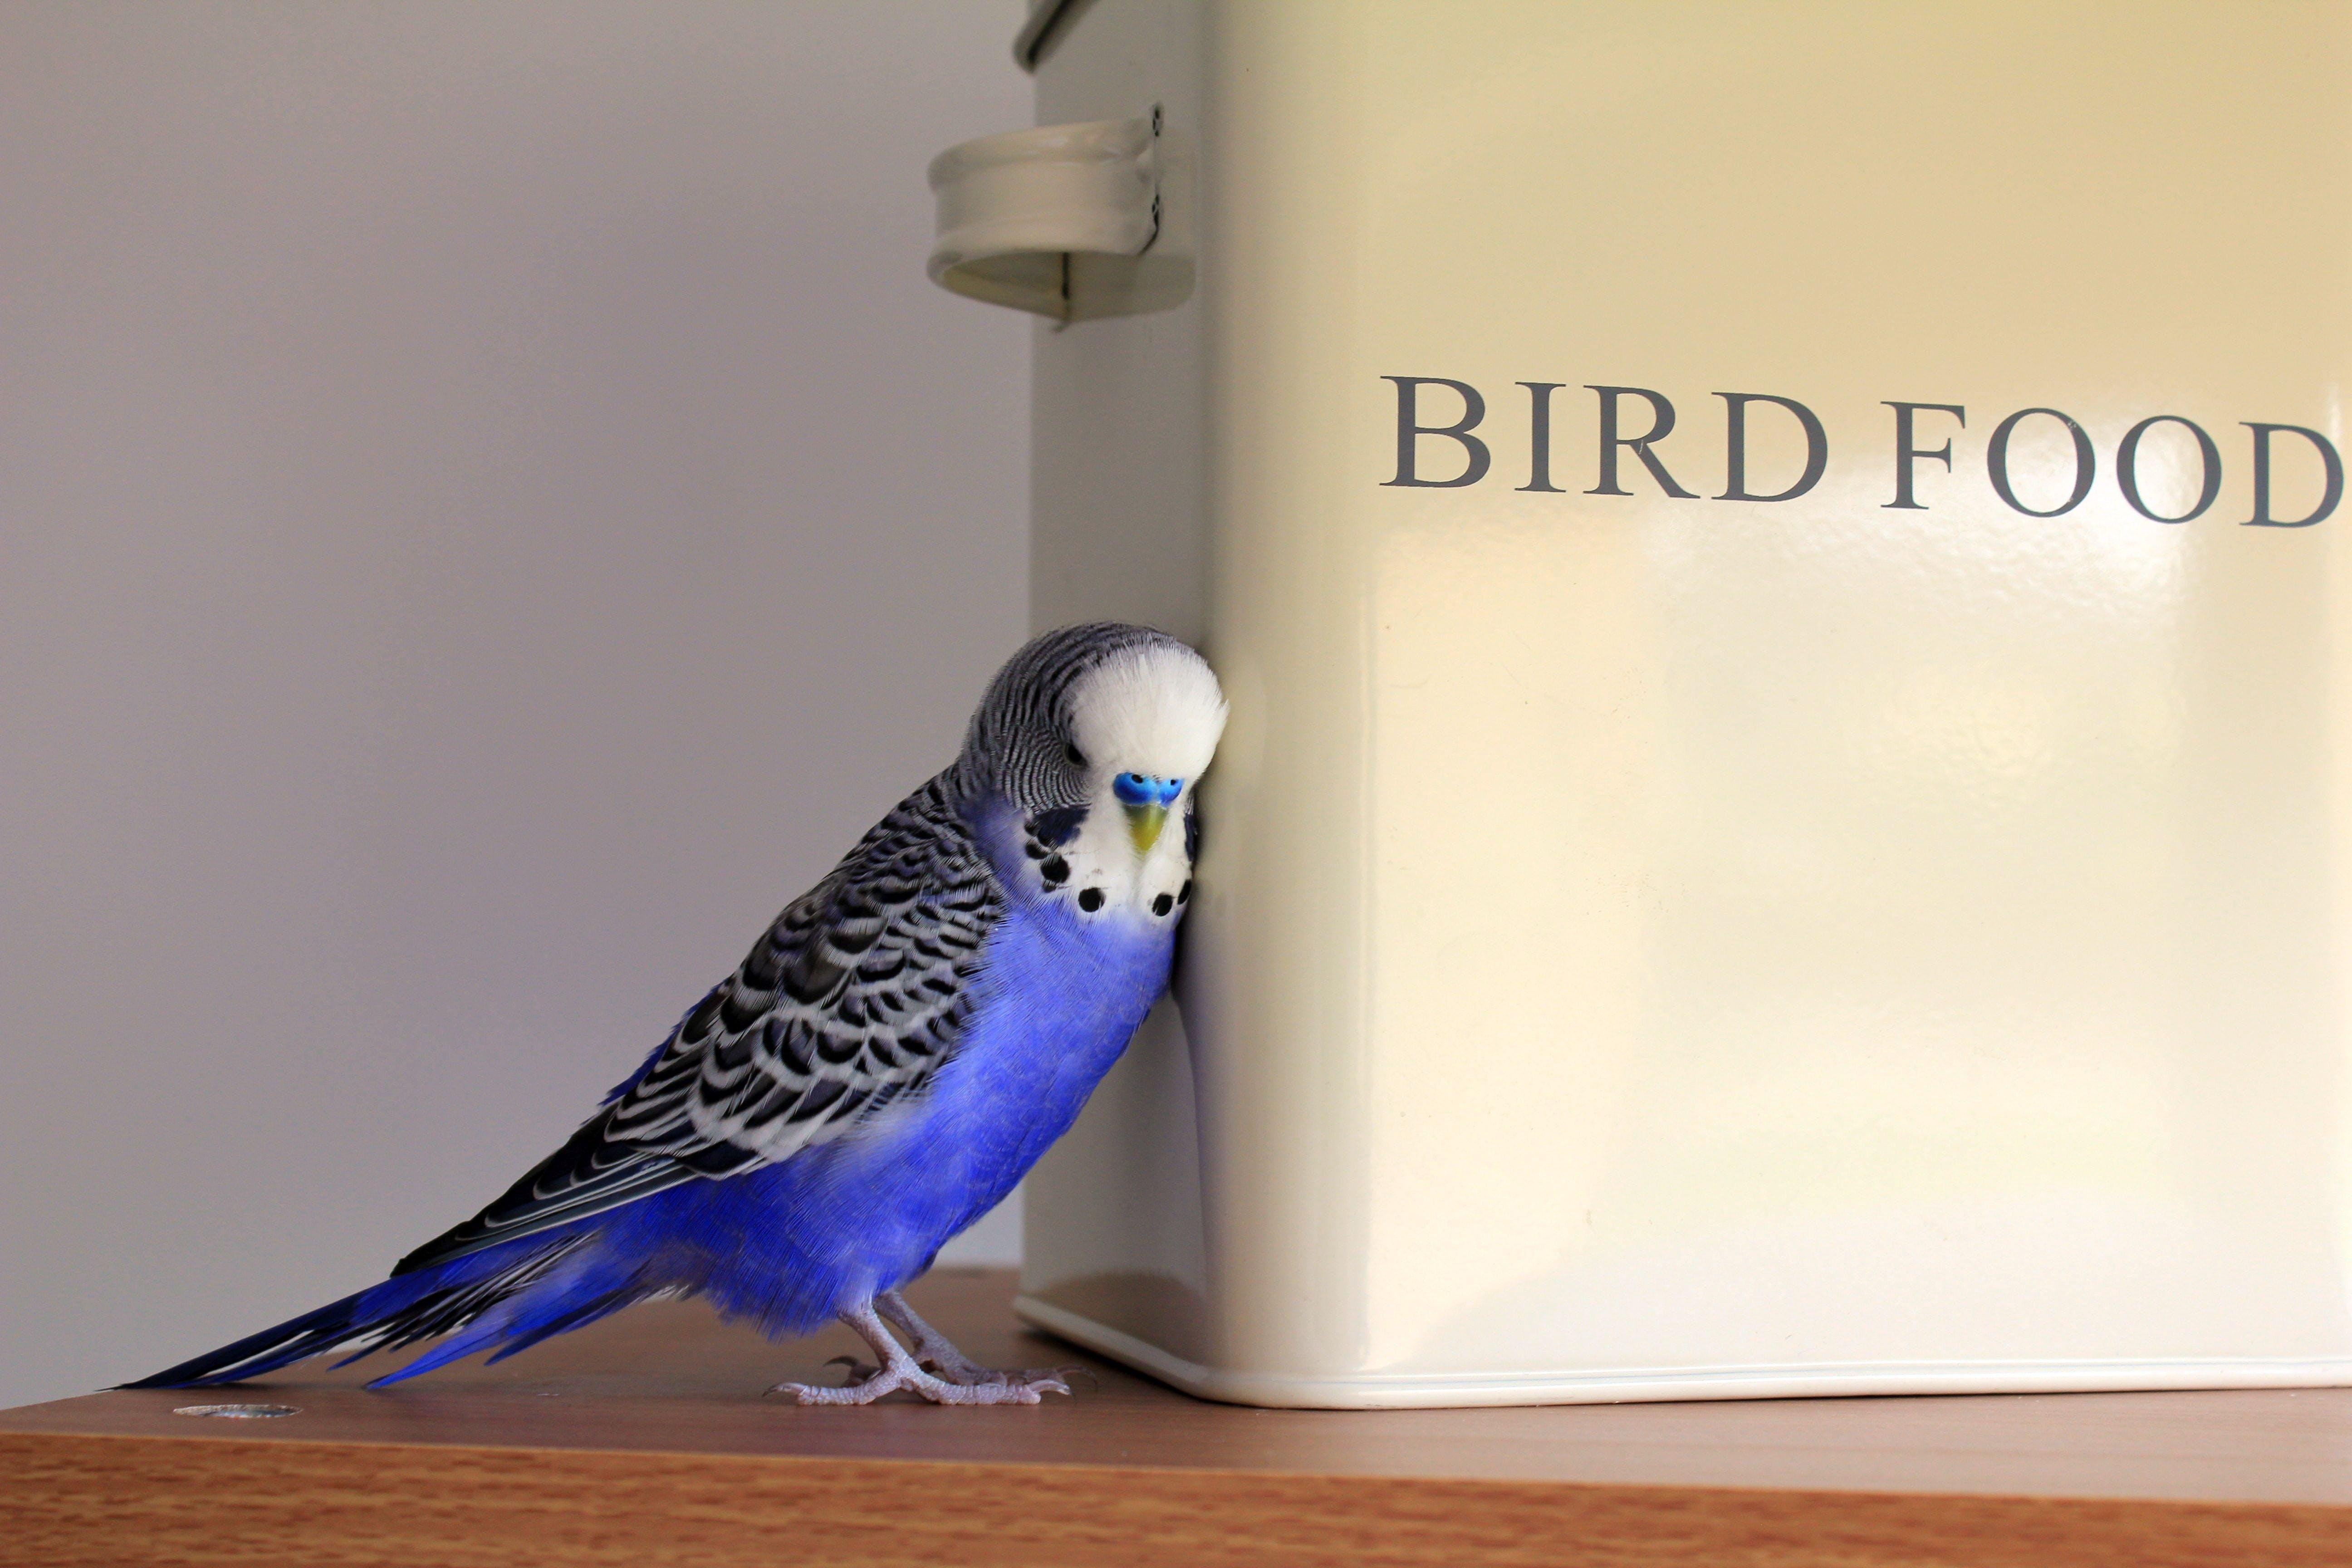 Blue, Black, and White Parakeet